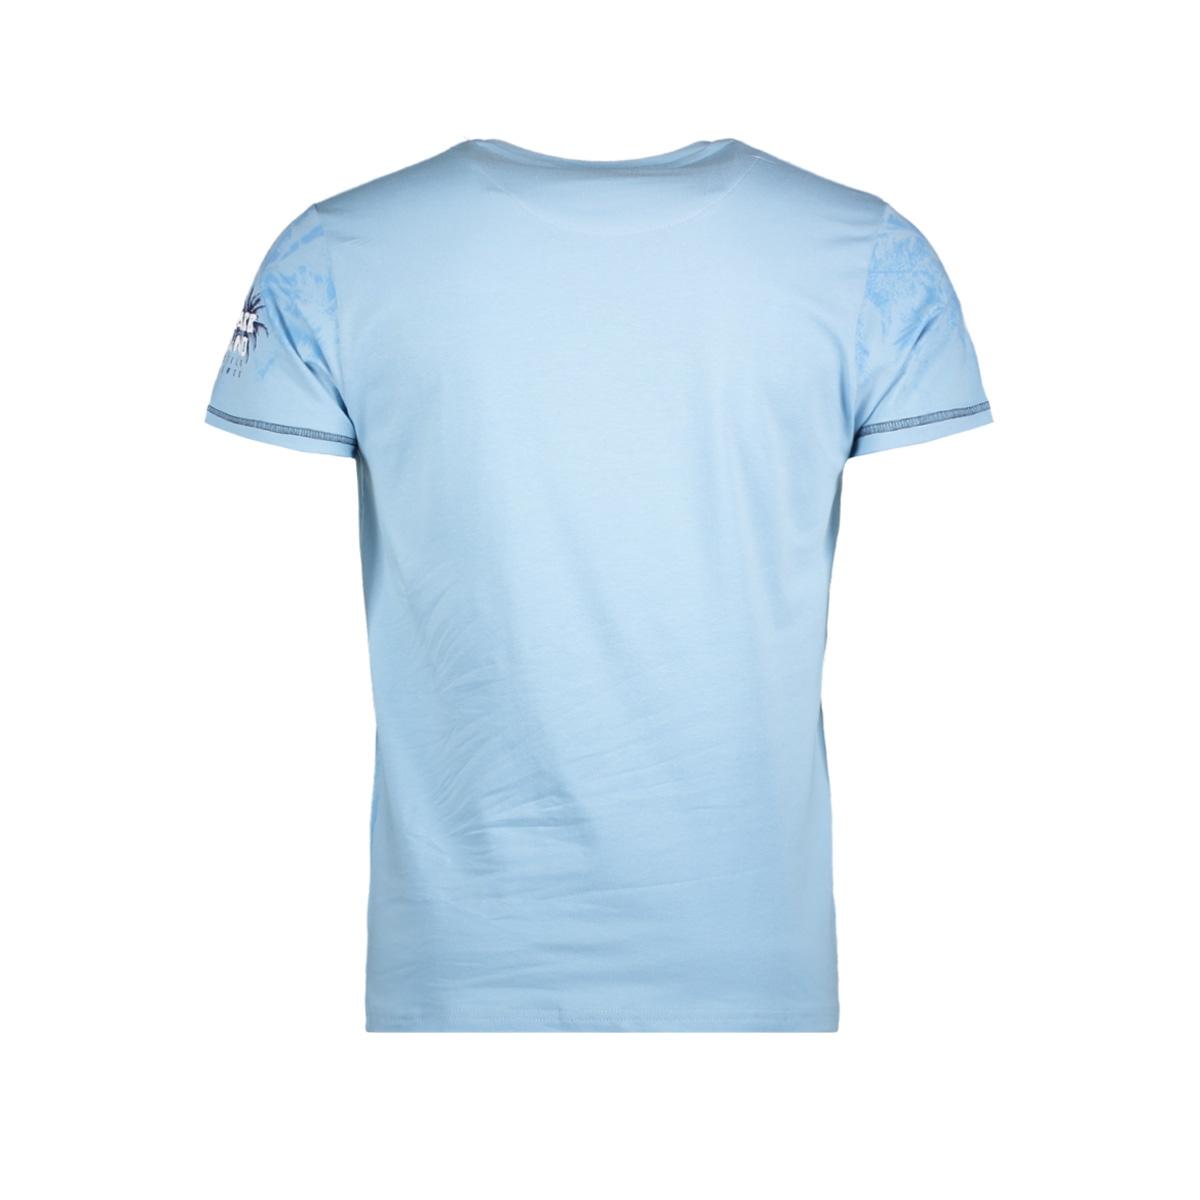 13879 gabbiano t-shirt light blue